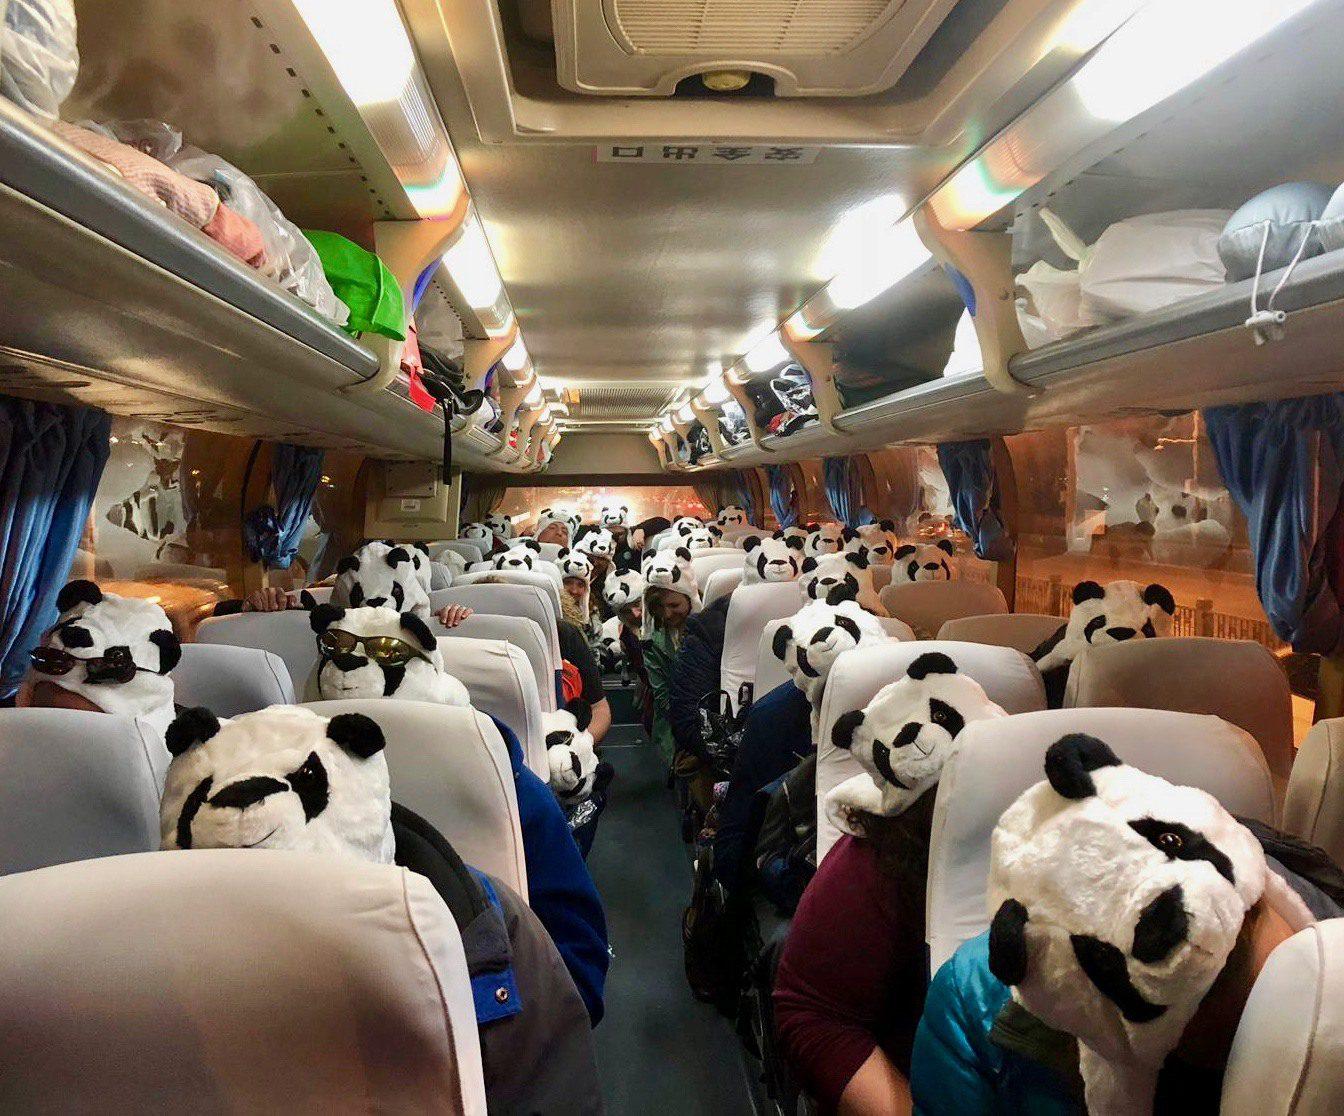 Dressed like pandas on the bus in Beijing, warming up for karaoke.